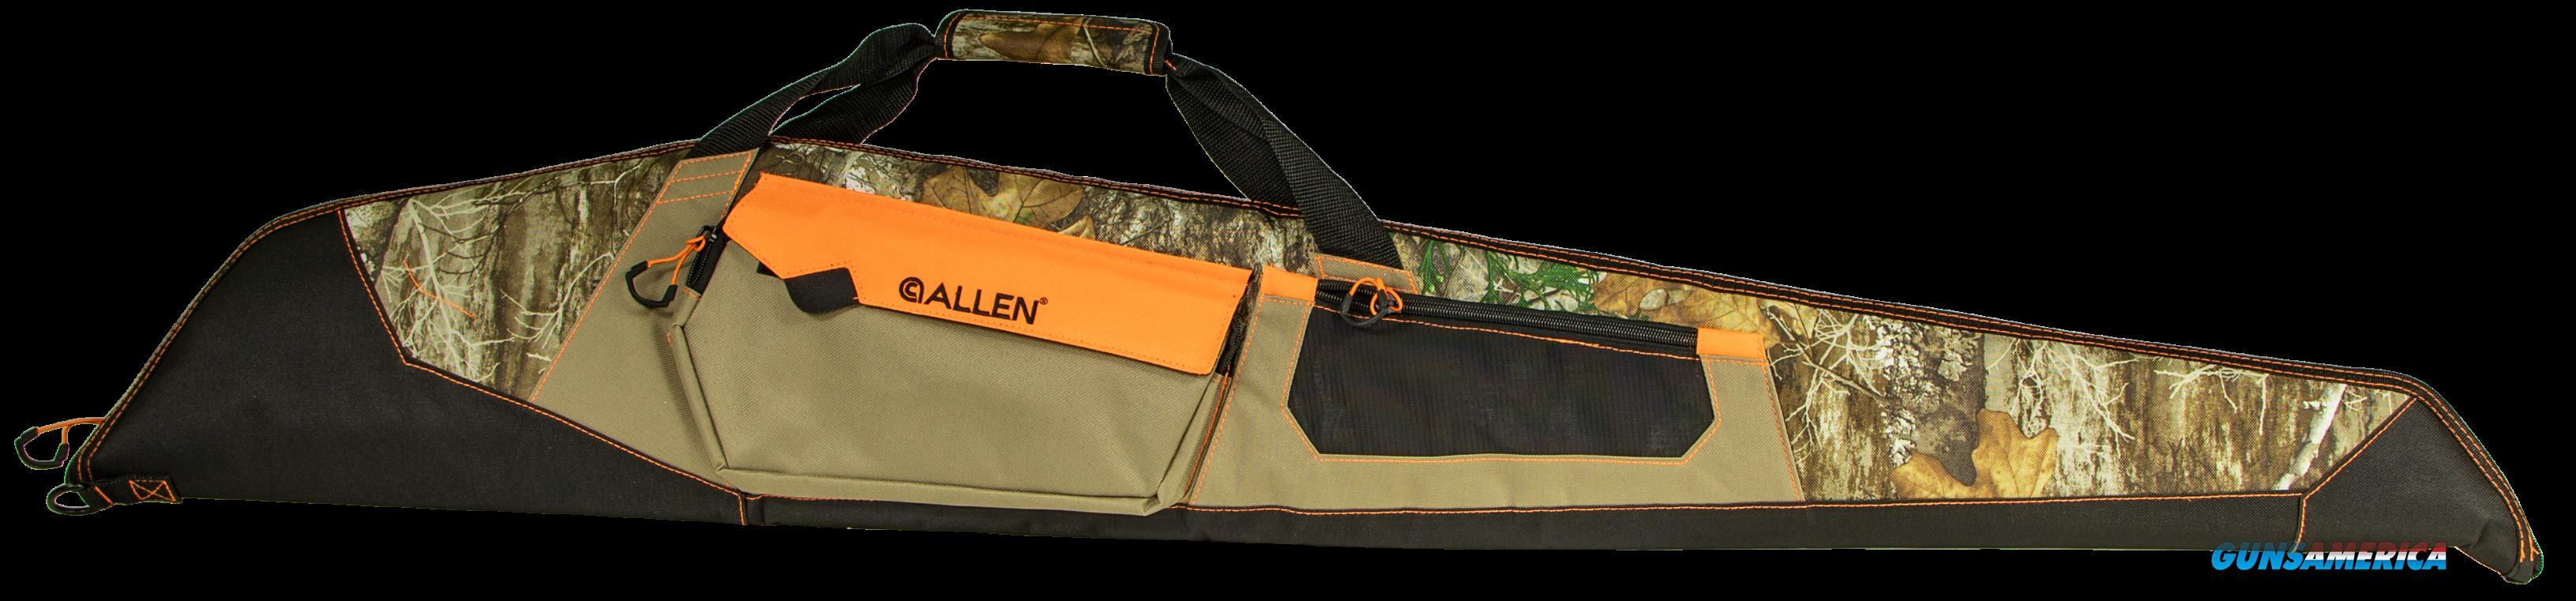 Allen Uncomphare, Allen 67752 Uncompahre Shotgun Case 52in Edge-blk  Guns > Pistols > 1911 Pistol Copies (non-Colt)